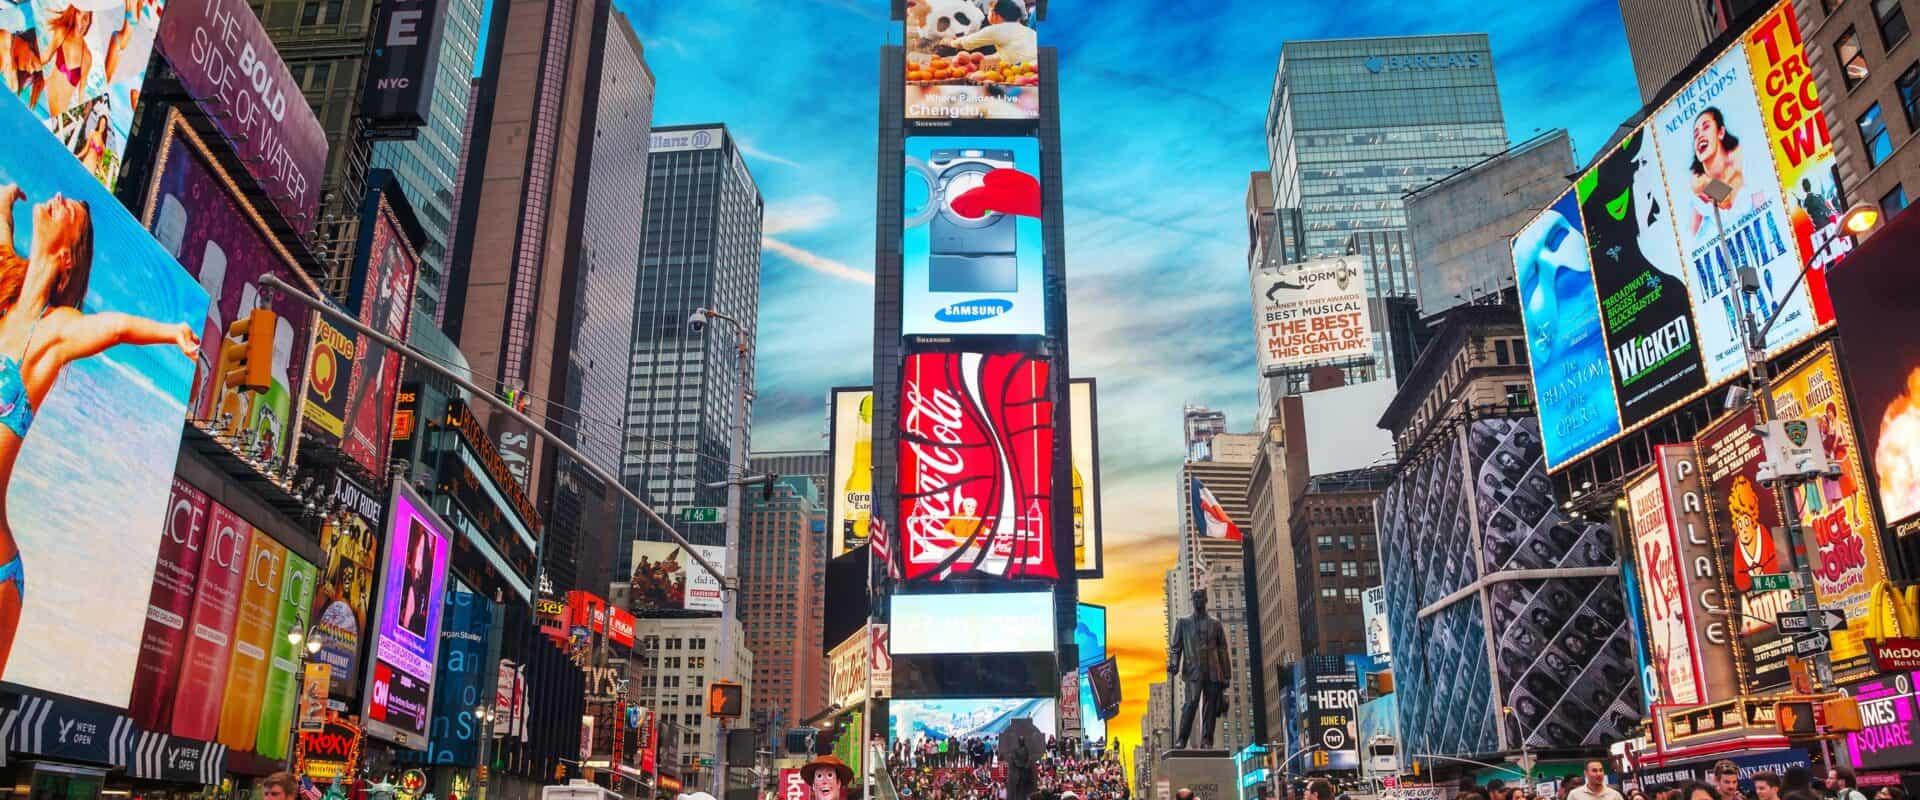 WPU Theatre students visit New York City.